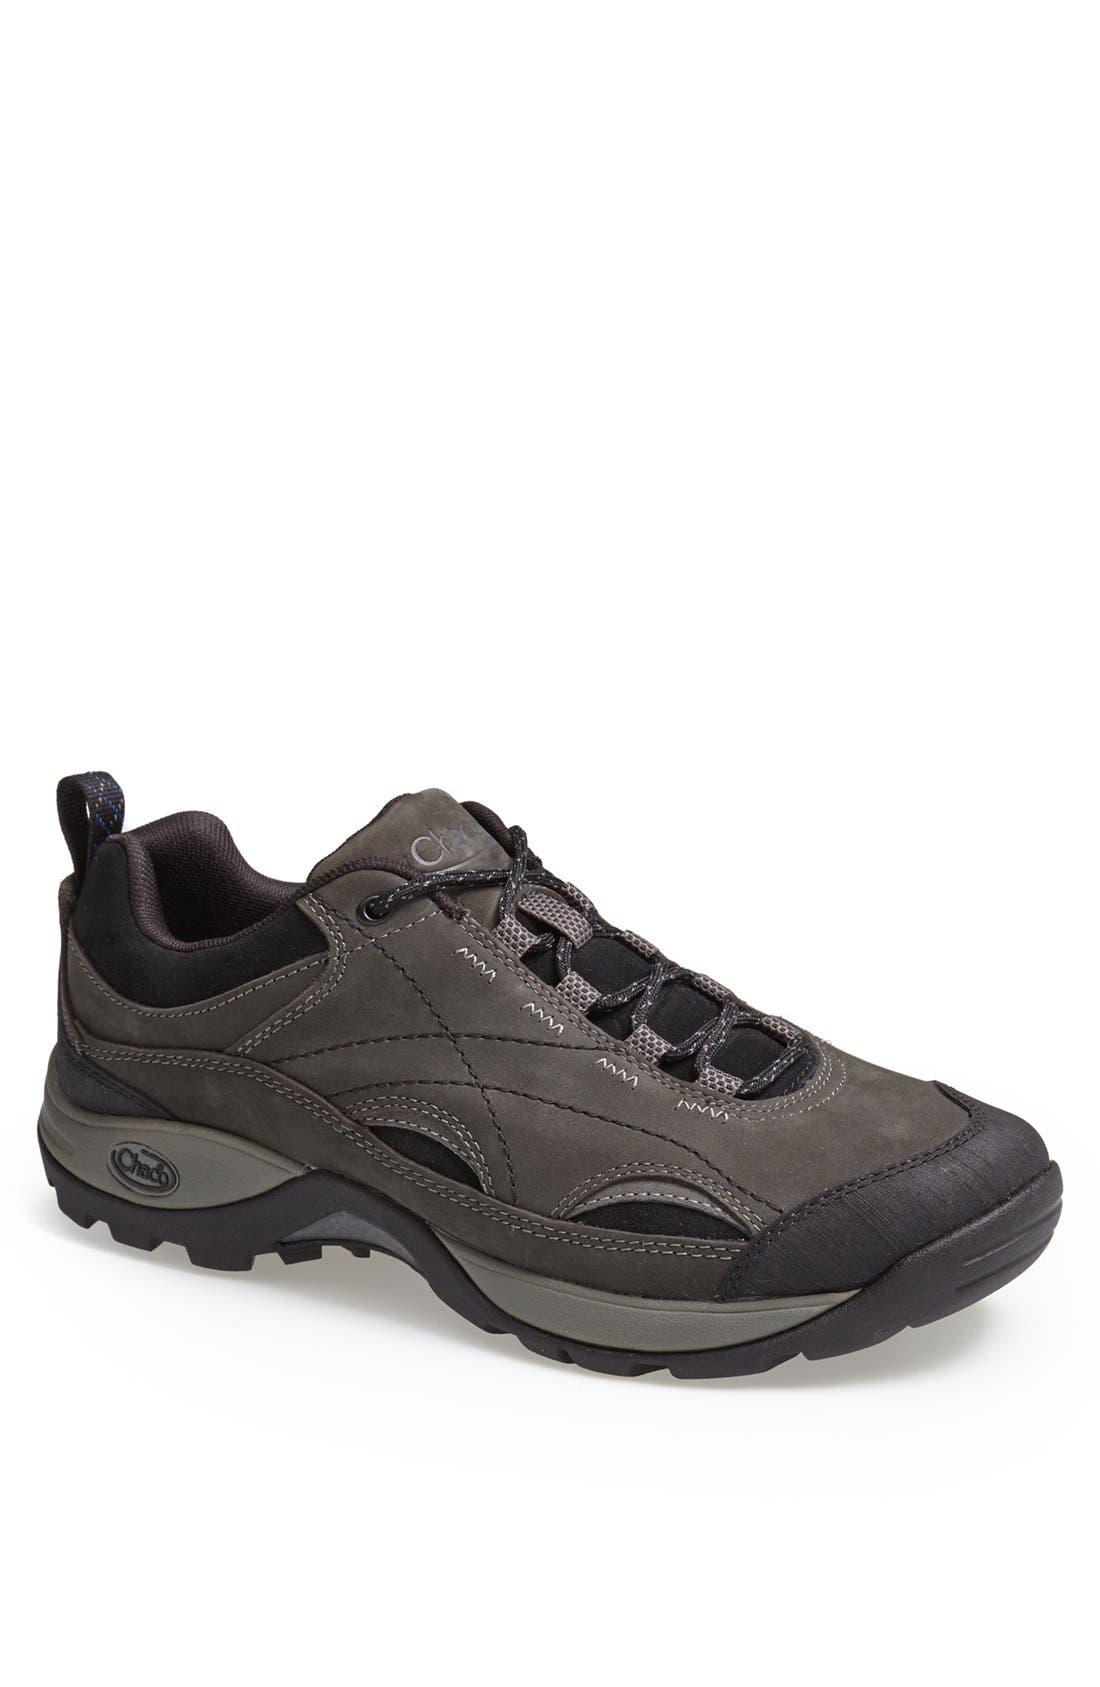 Main Image - Chaco 'Hinterland' Hiking Shoe   (Men)